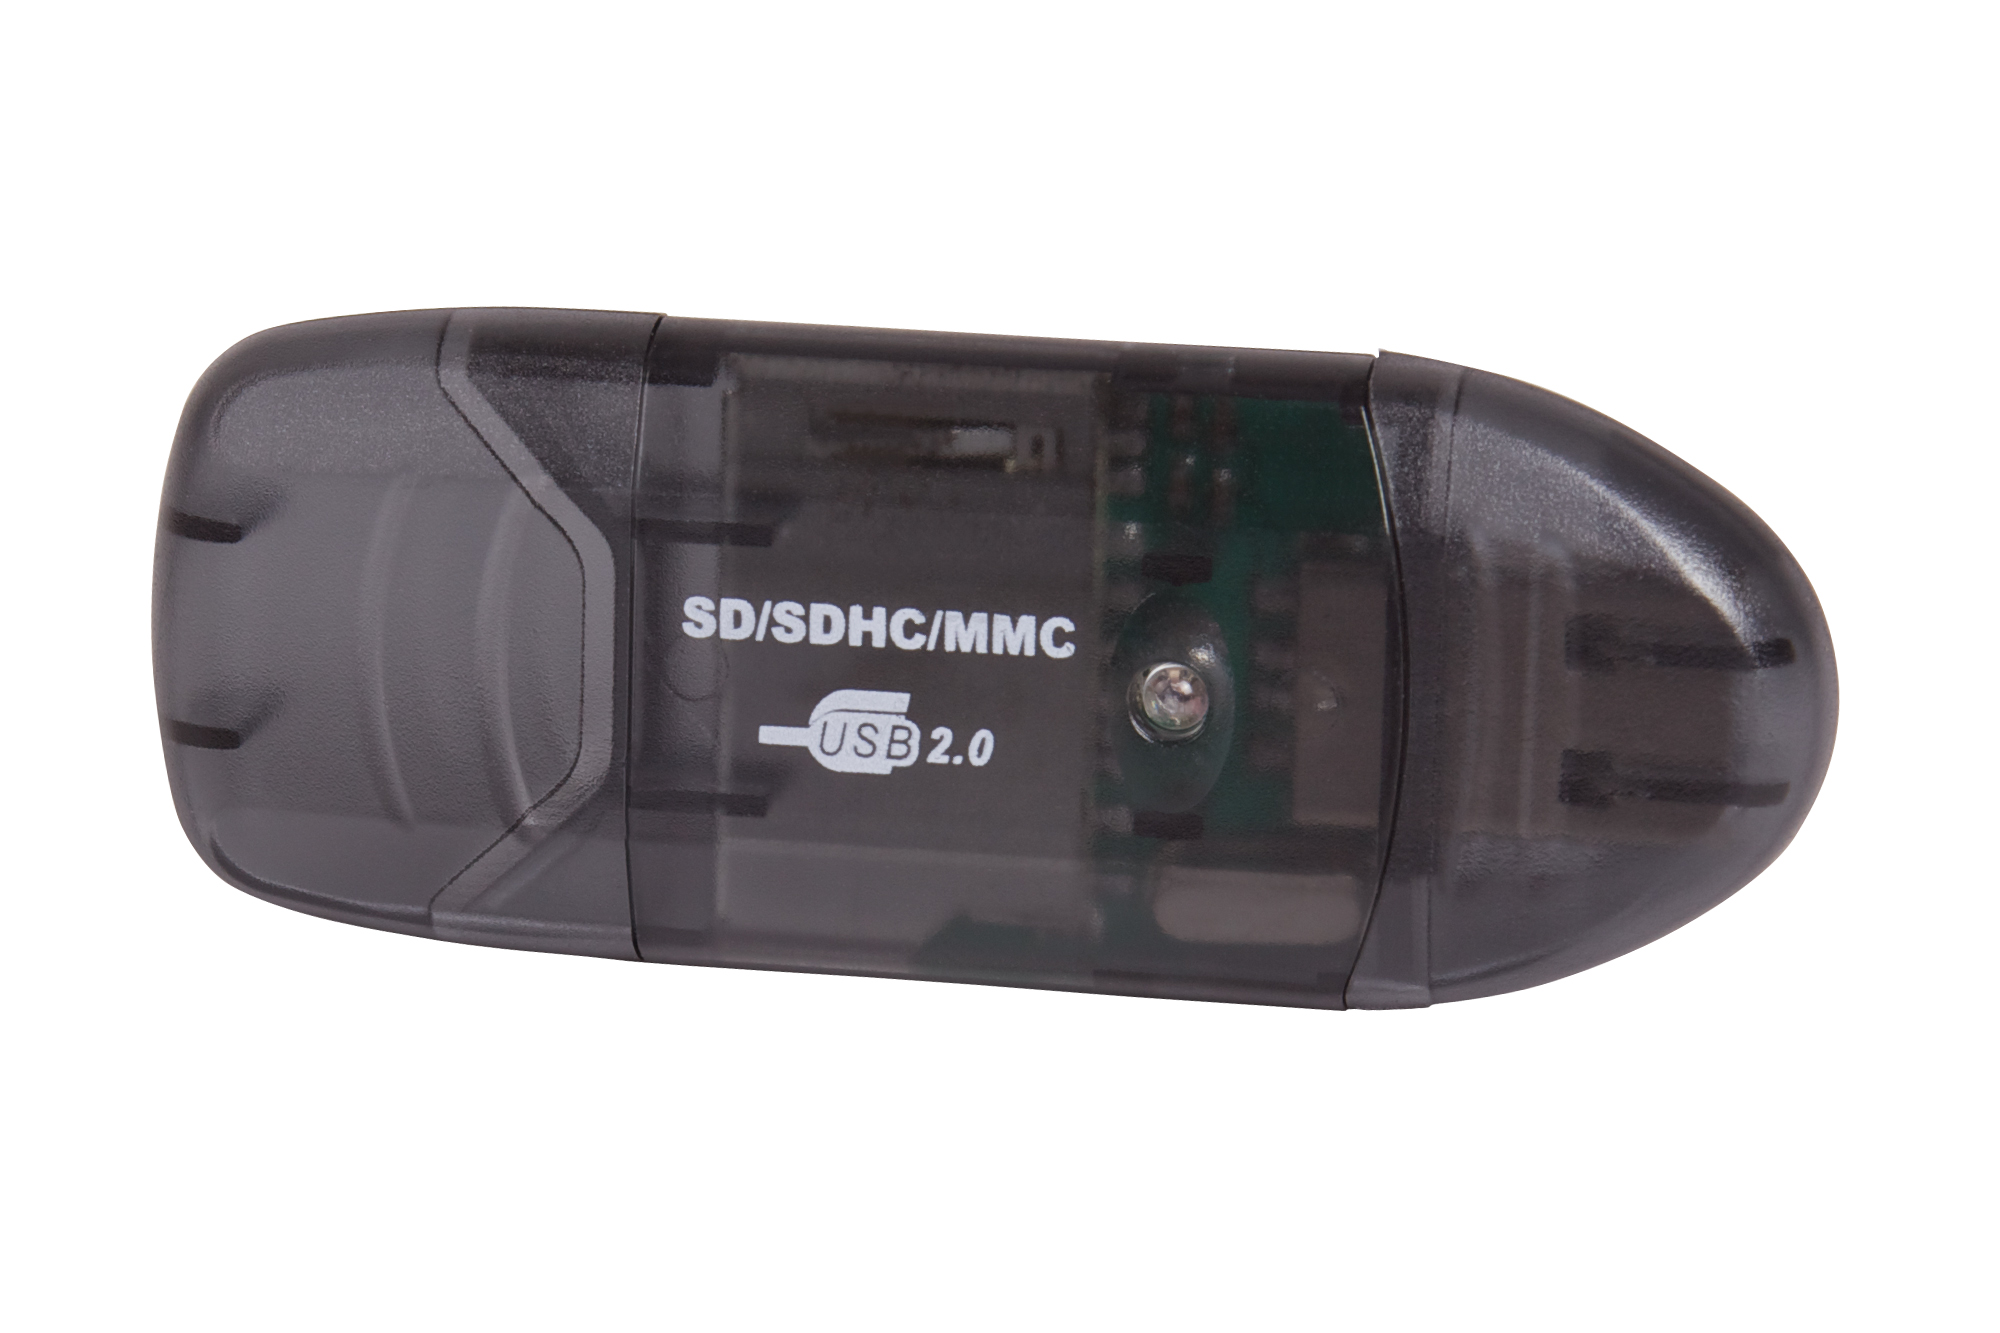 NEDIS Basic XL USB 2.0 SD Card Reader